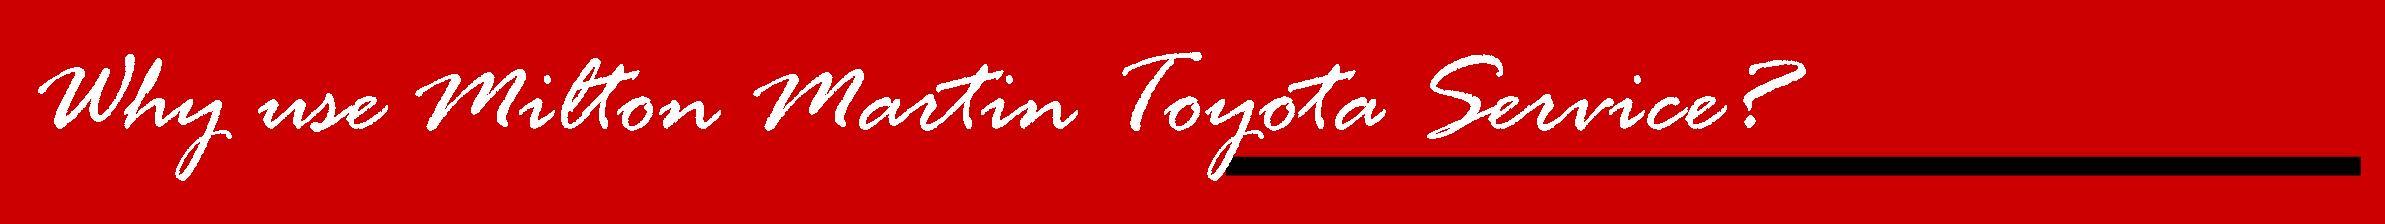 Why use Milton Martgon Toyota Service?